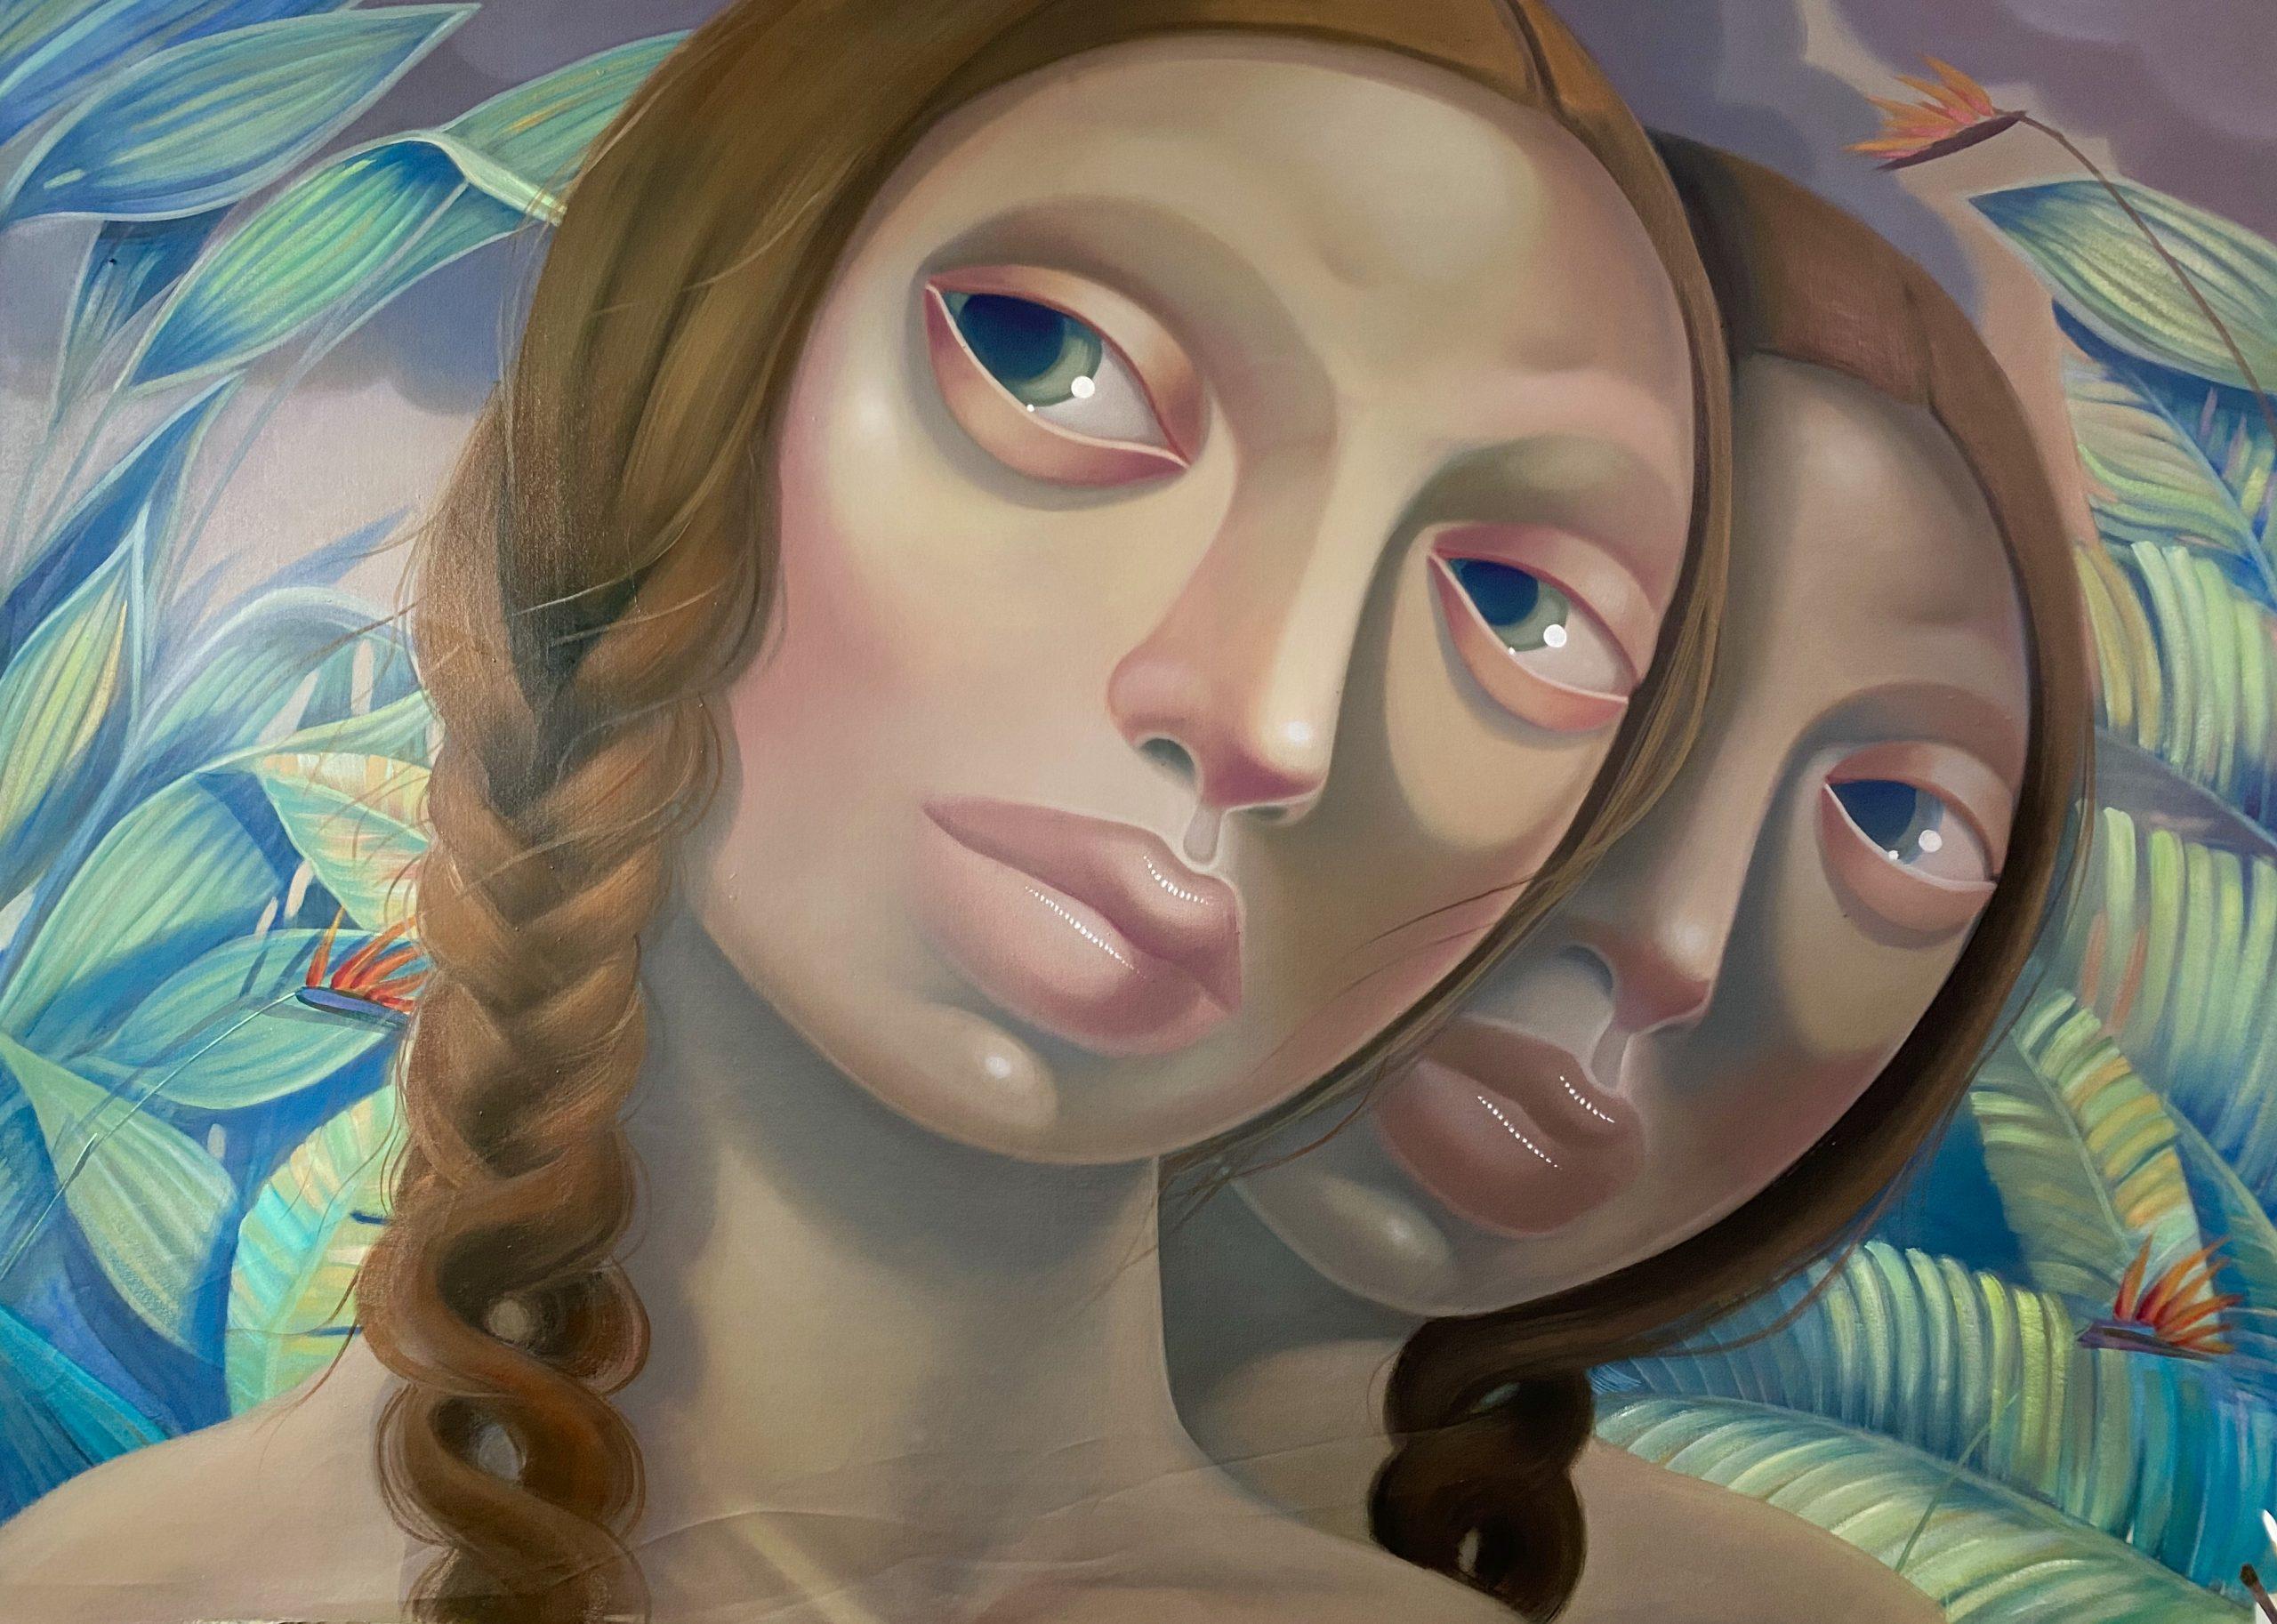 Double Take by Tania Marmolejo